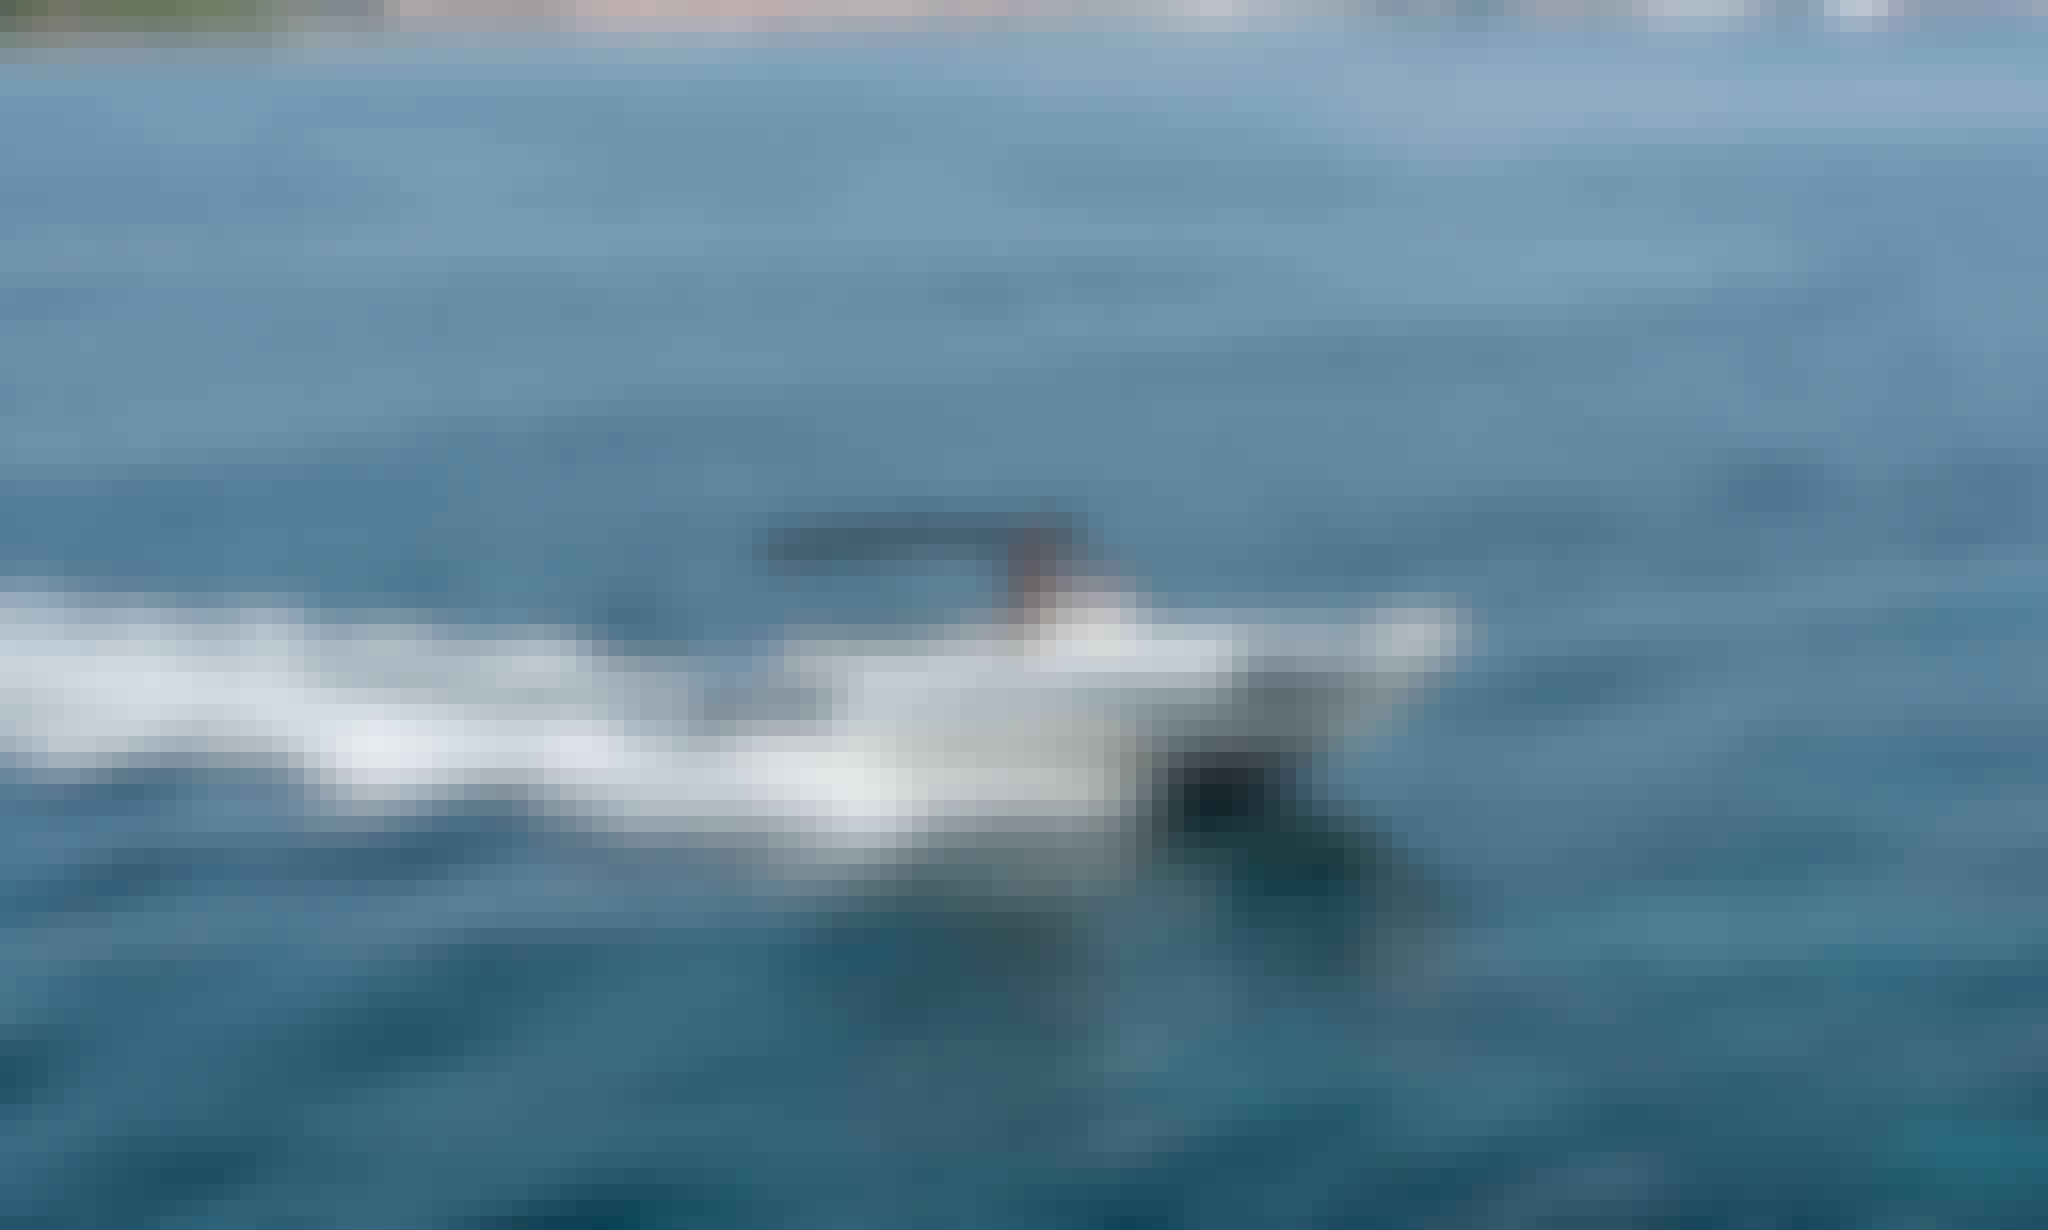 Rent this 2019 Marlin 790 Pro Dynamic RIB in Trogir and Split